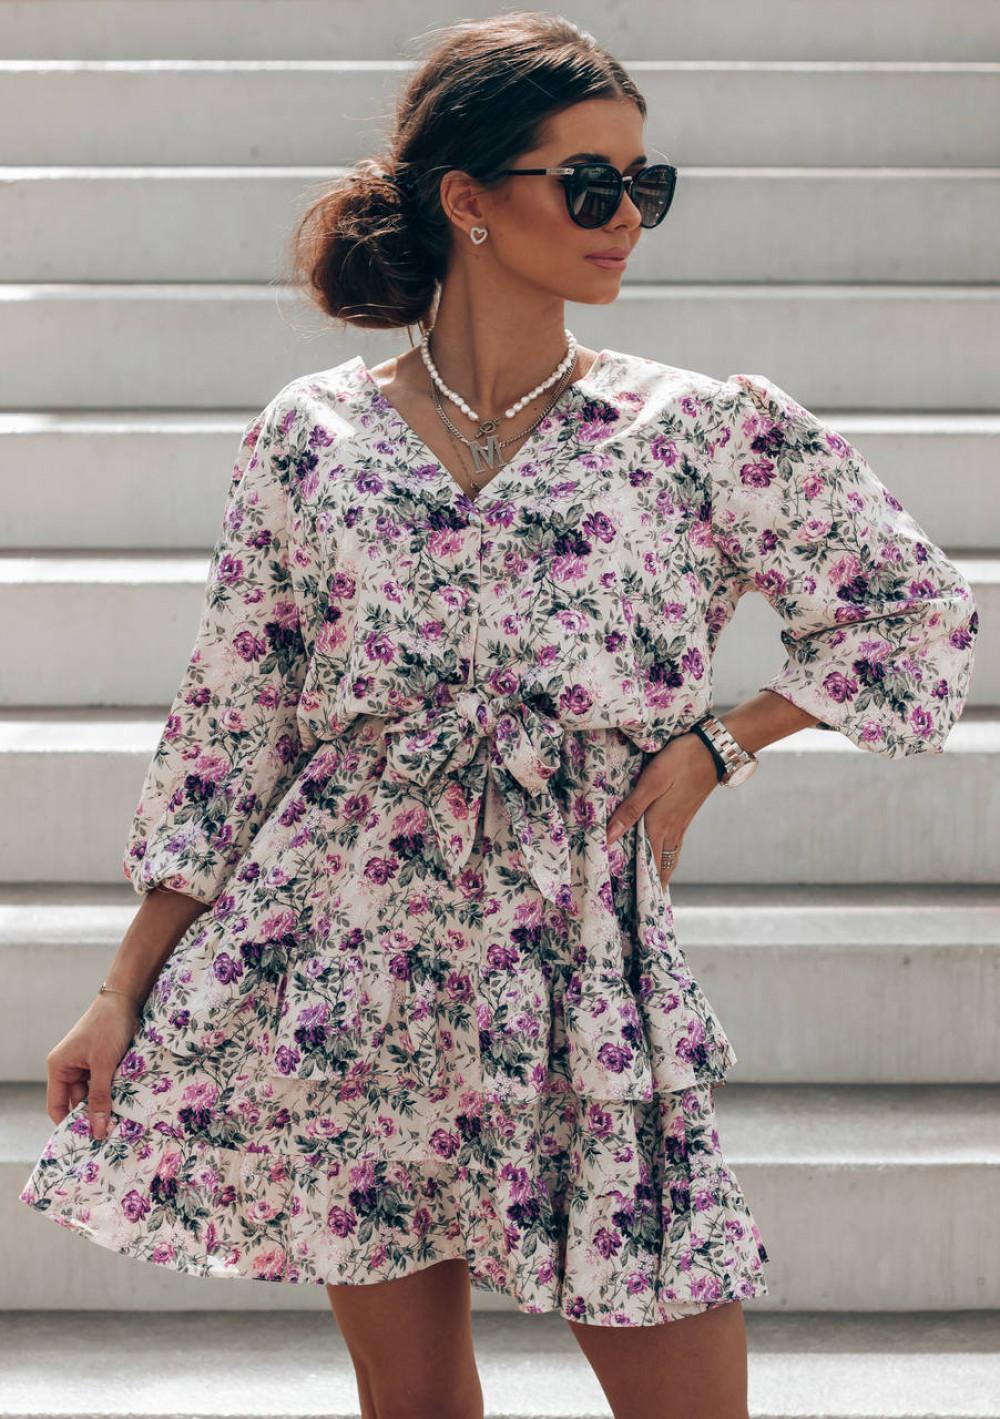 Fioletowa sukienka kwiatowa rozkloszowana z falbankami Abella 1